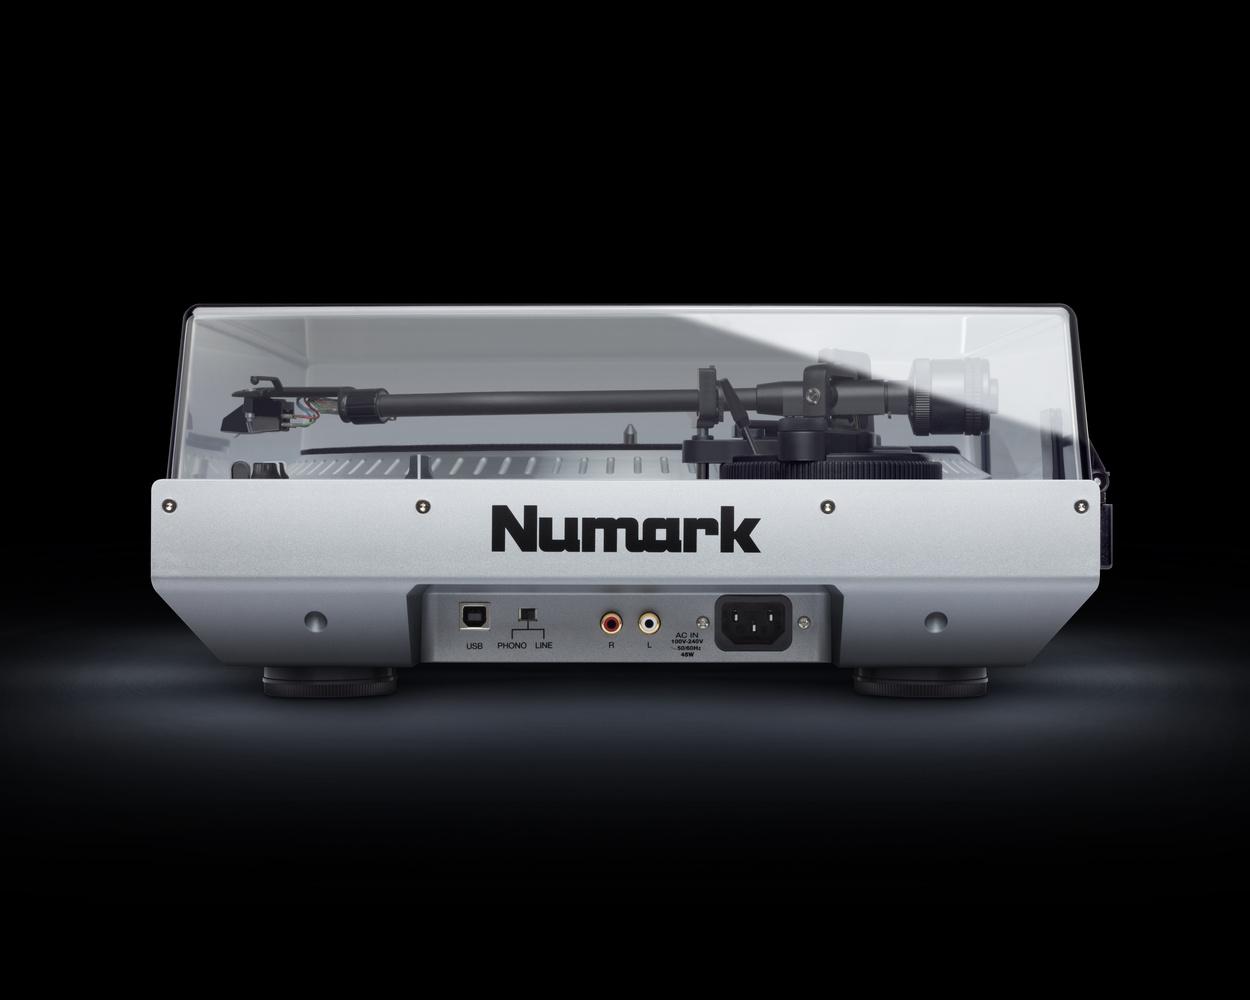 Numark NTX1000 by William Bond